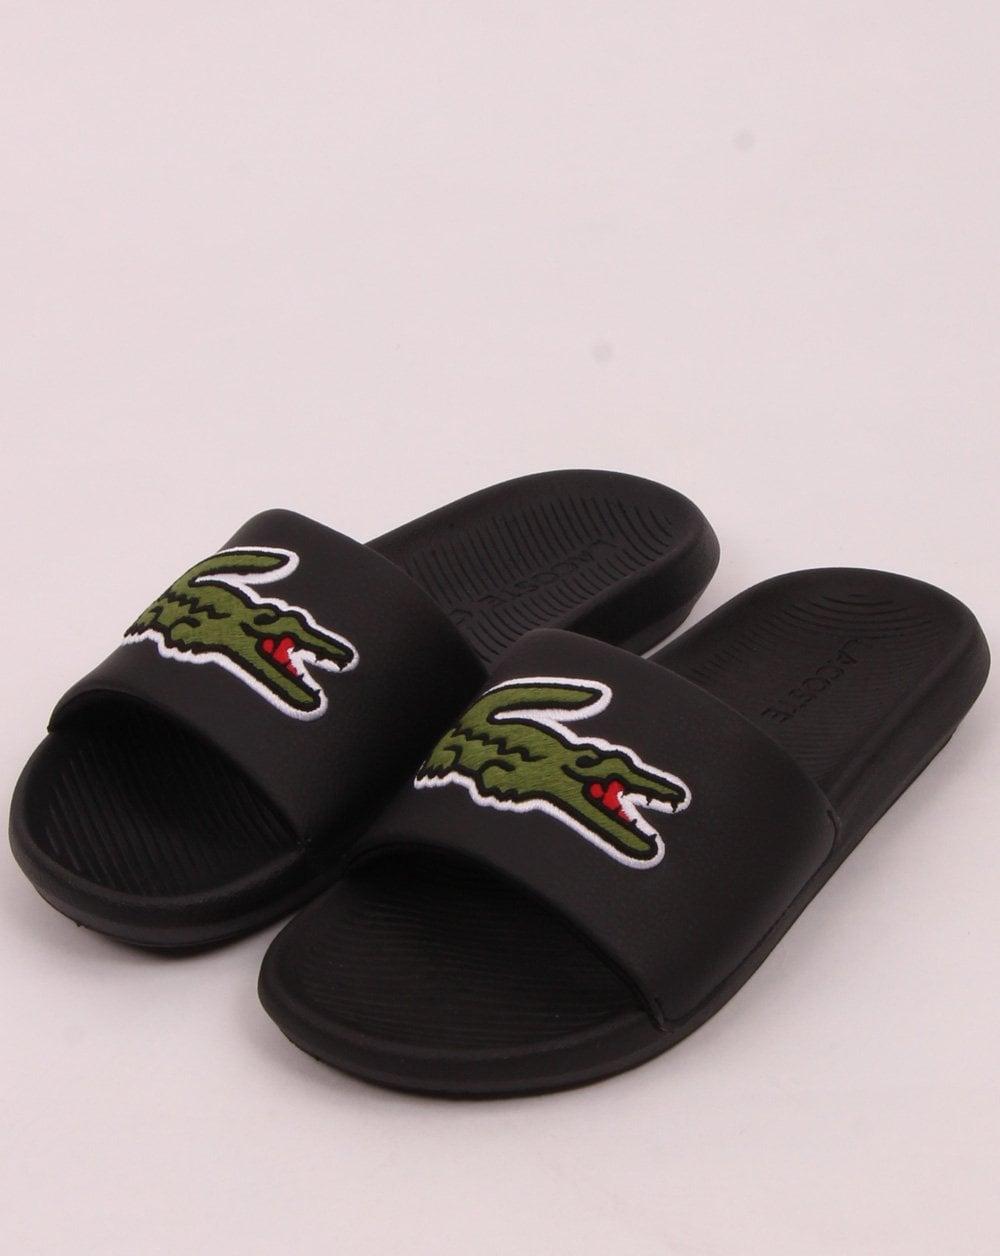 Lacoste Croco Slide Black/Green